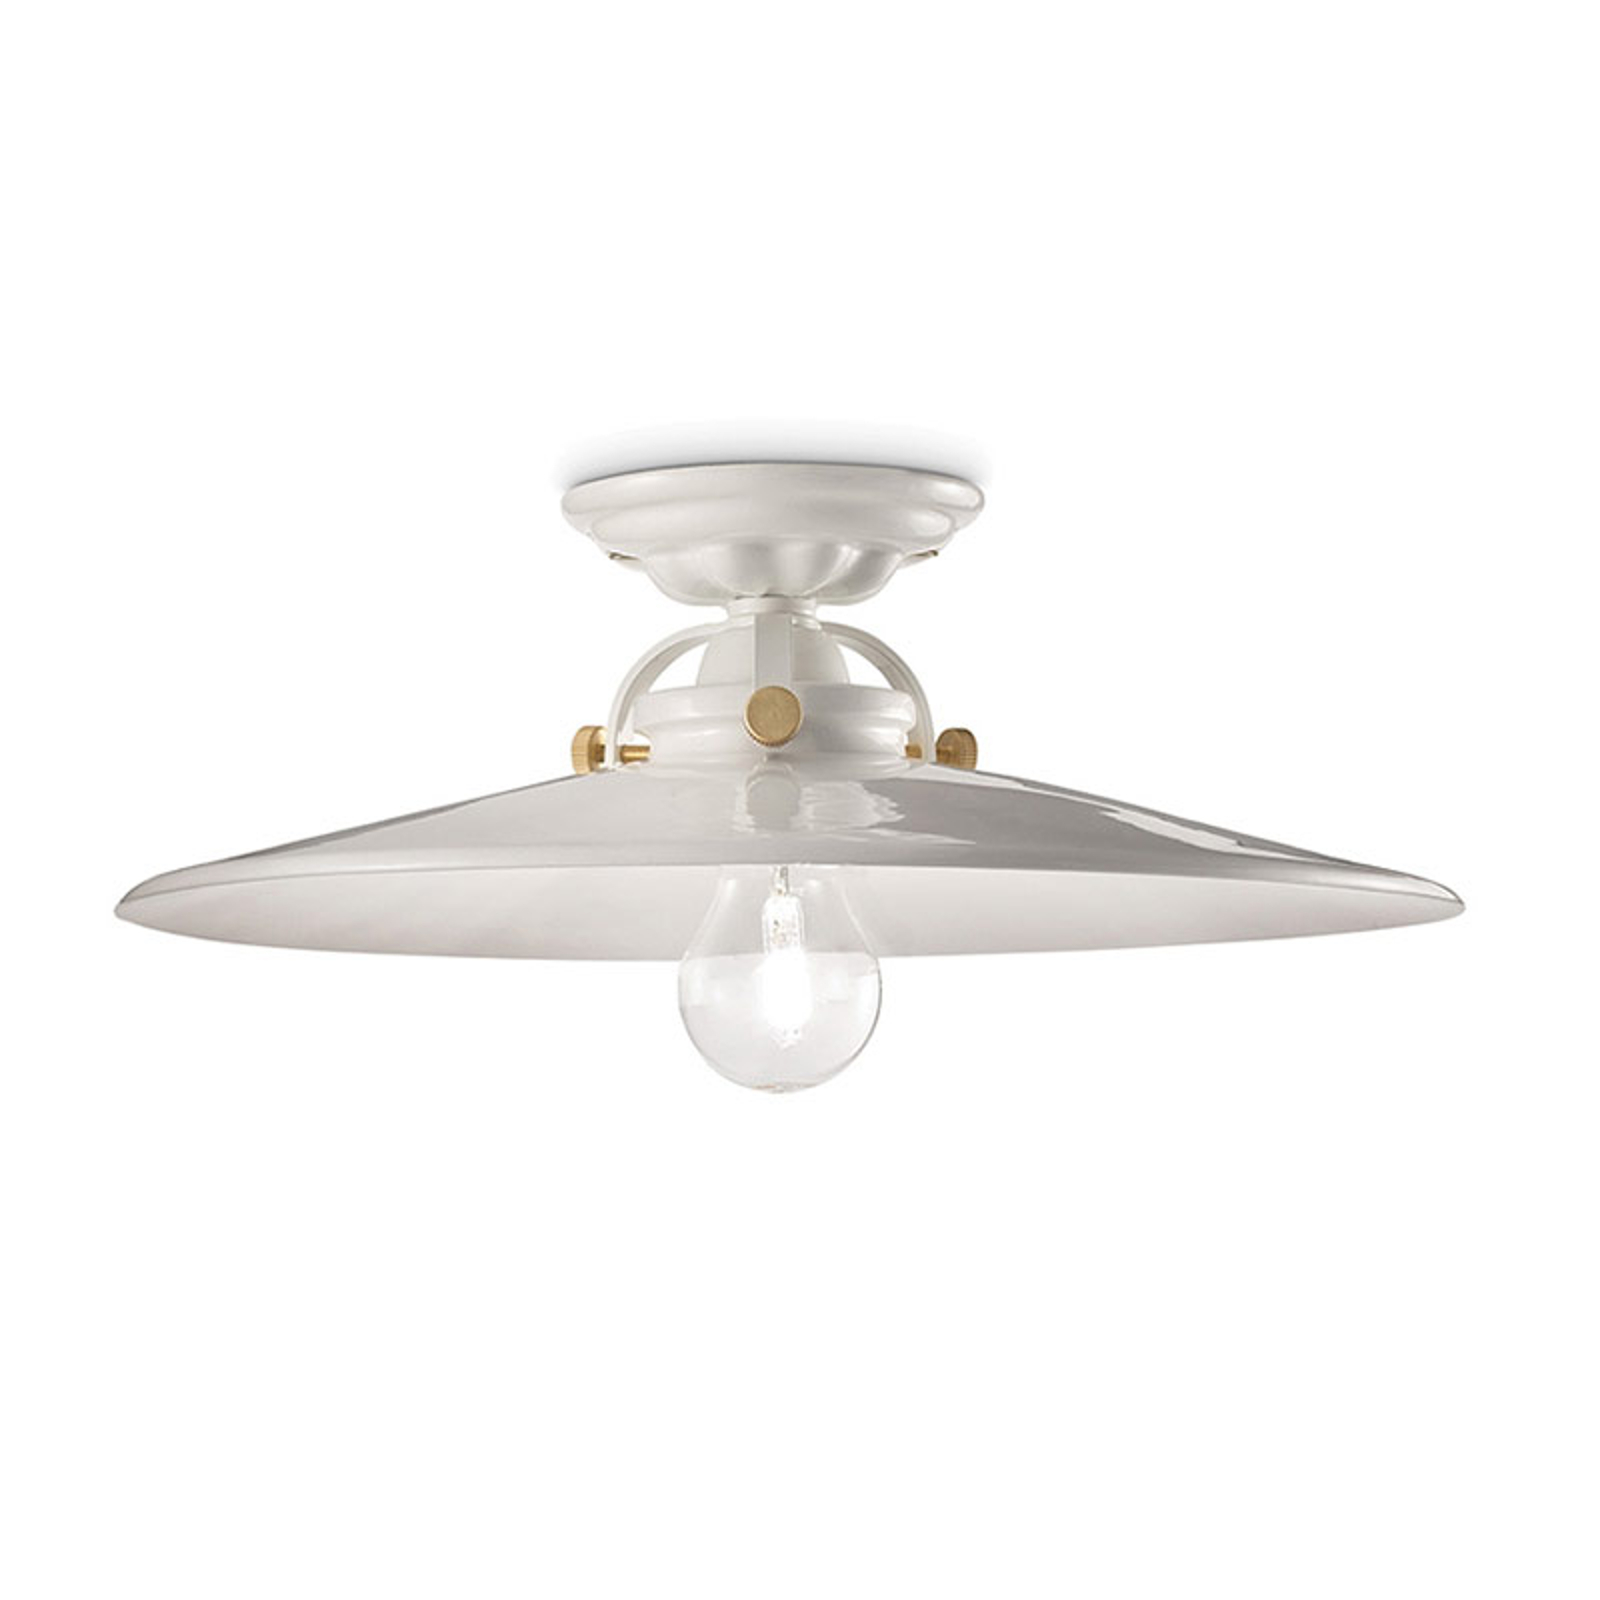 Retro plafondlamp C105 wit